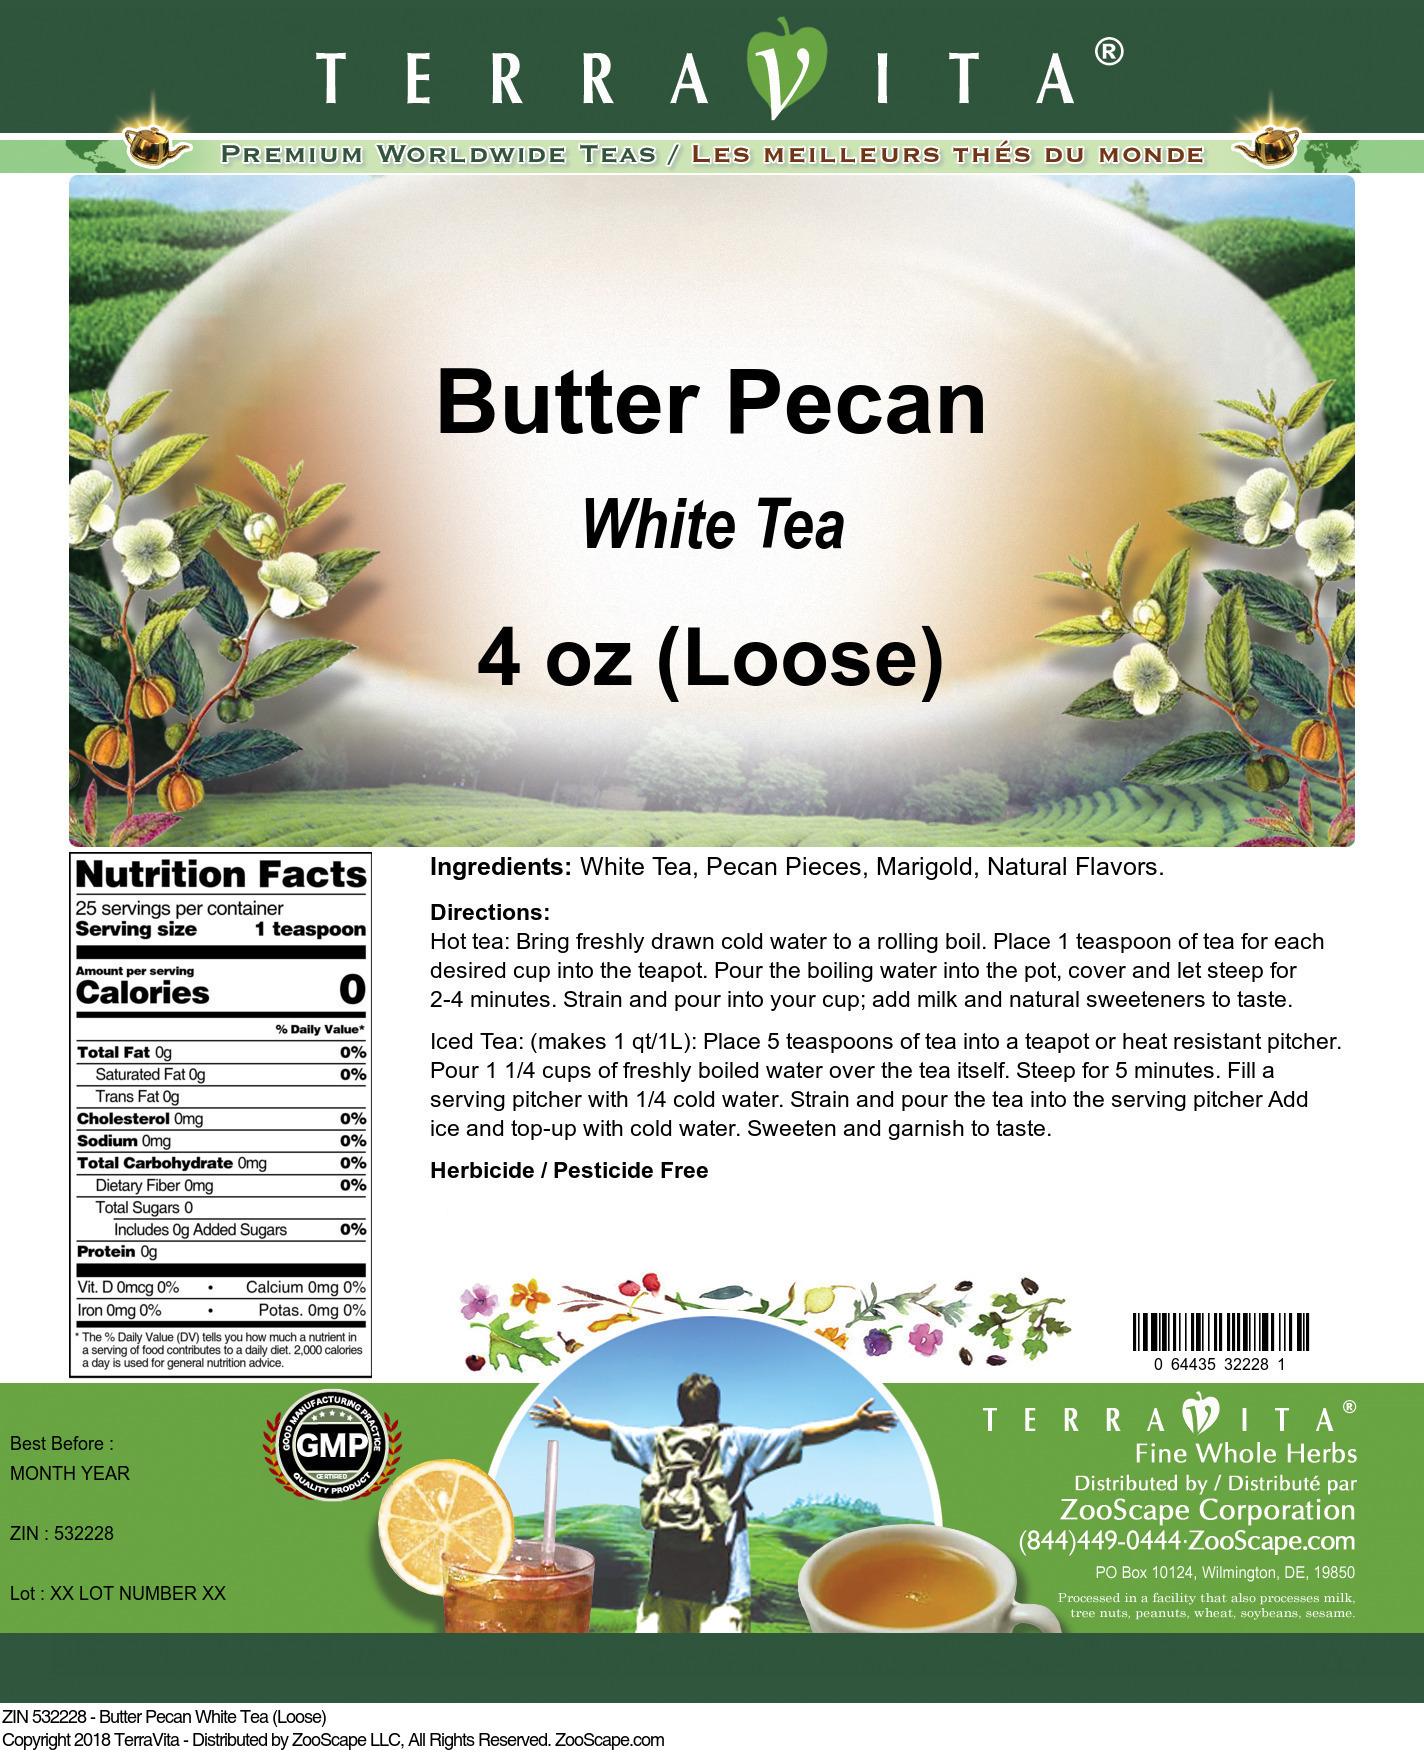 Butter Pecan White Tea (Loose)